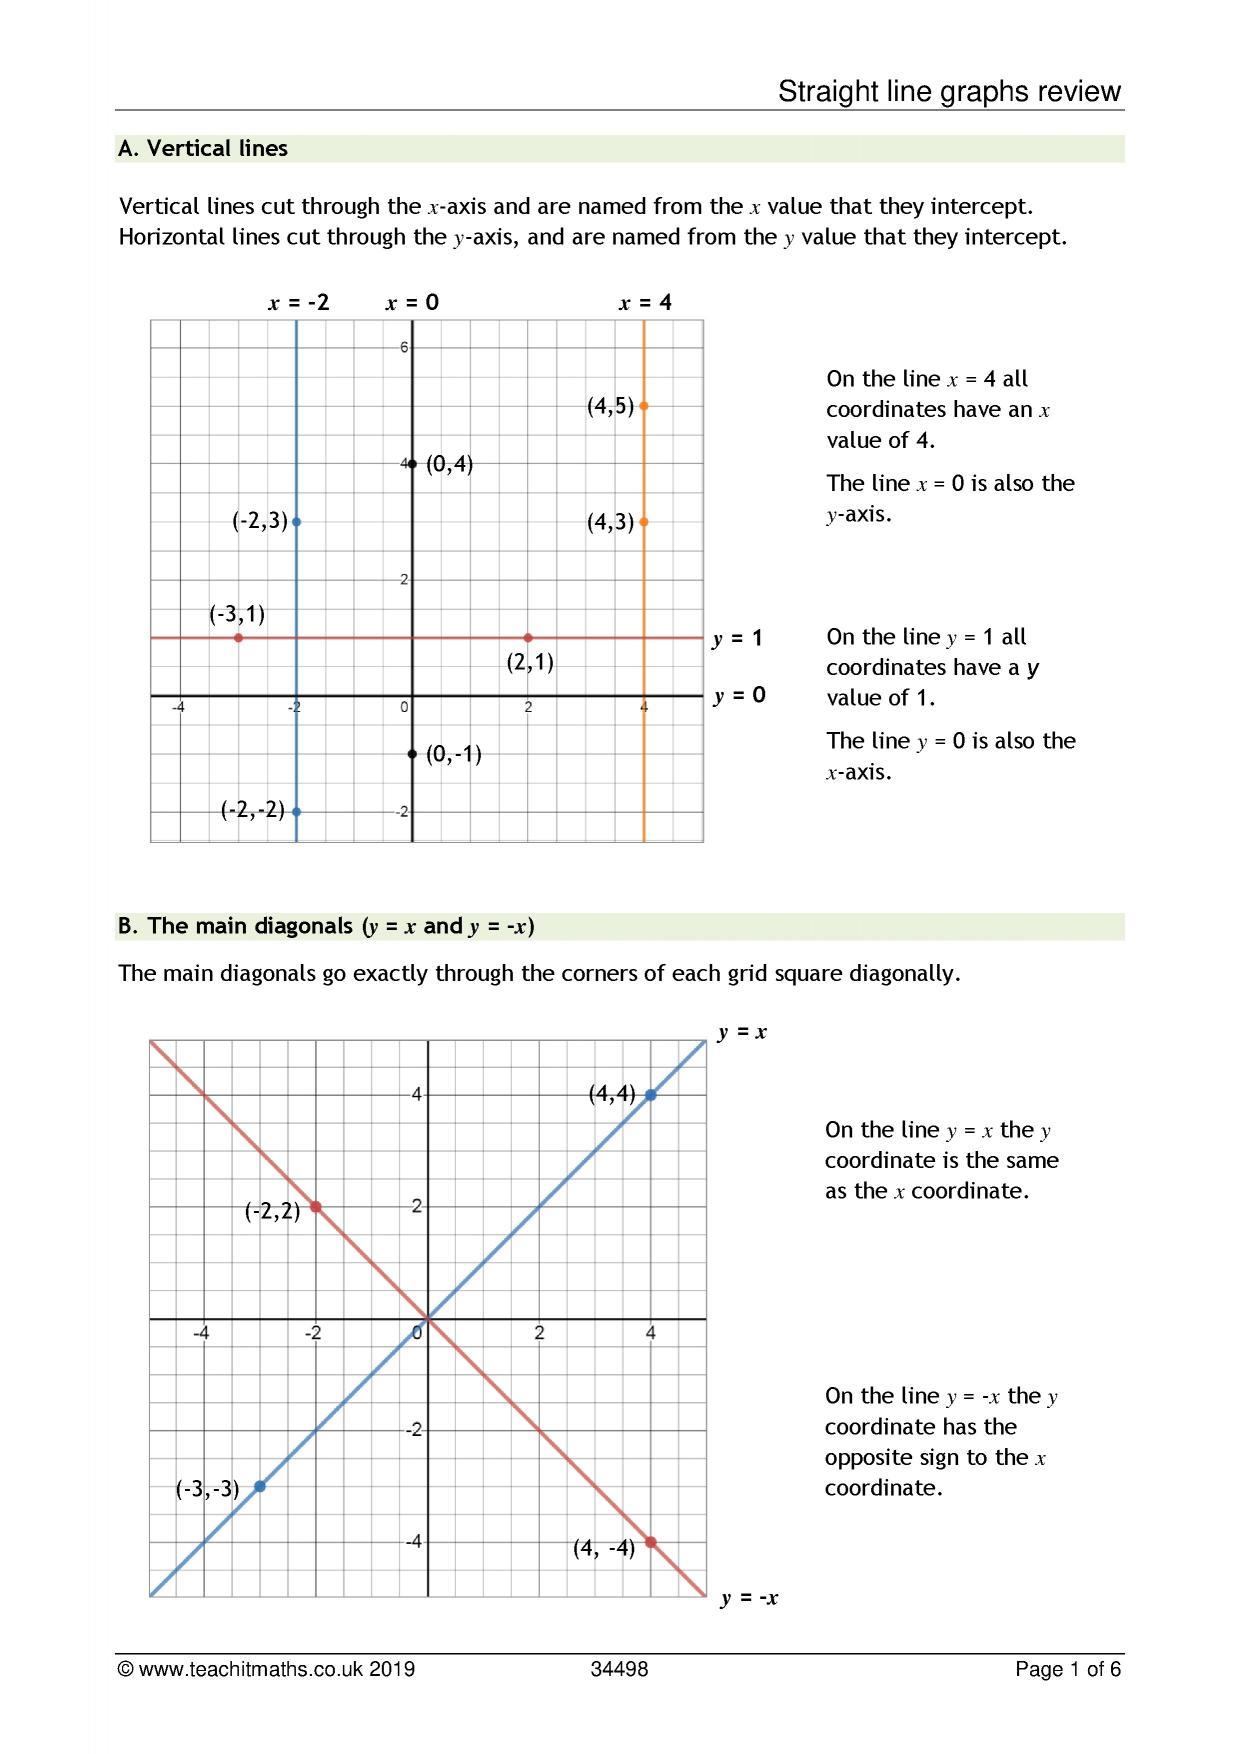 KS4 GCSE maths | Straight line graphs review